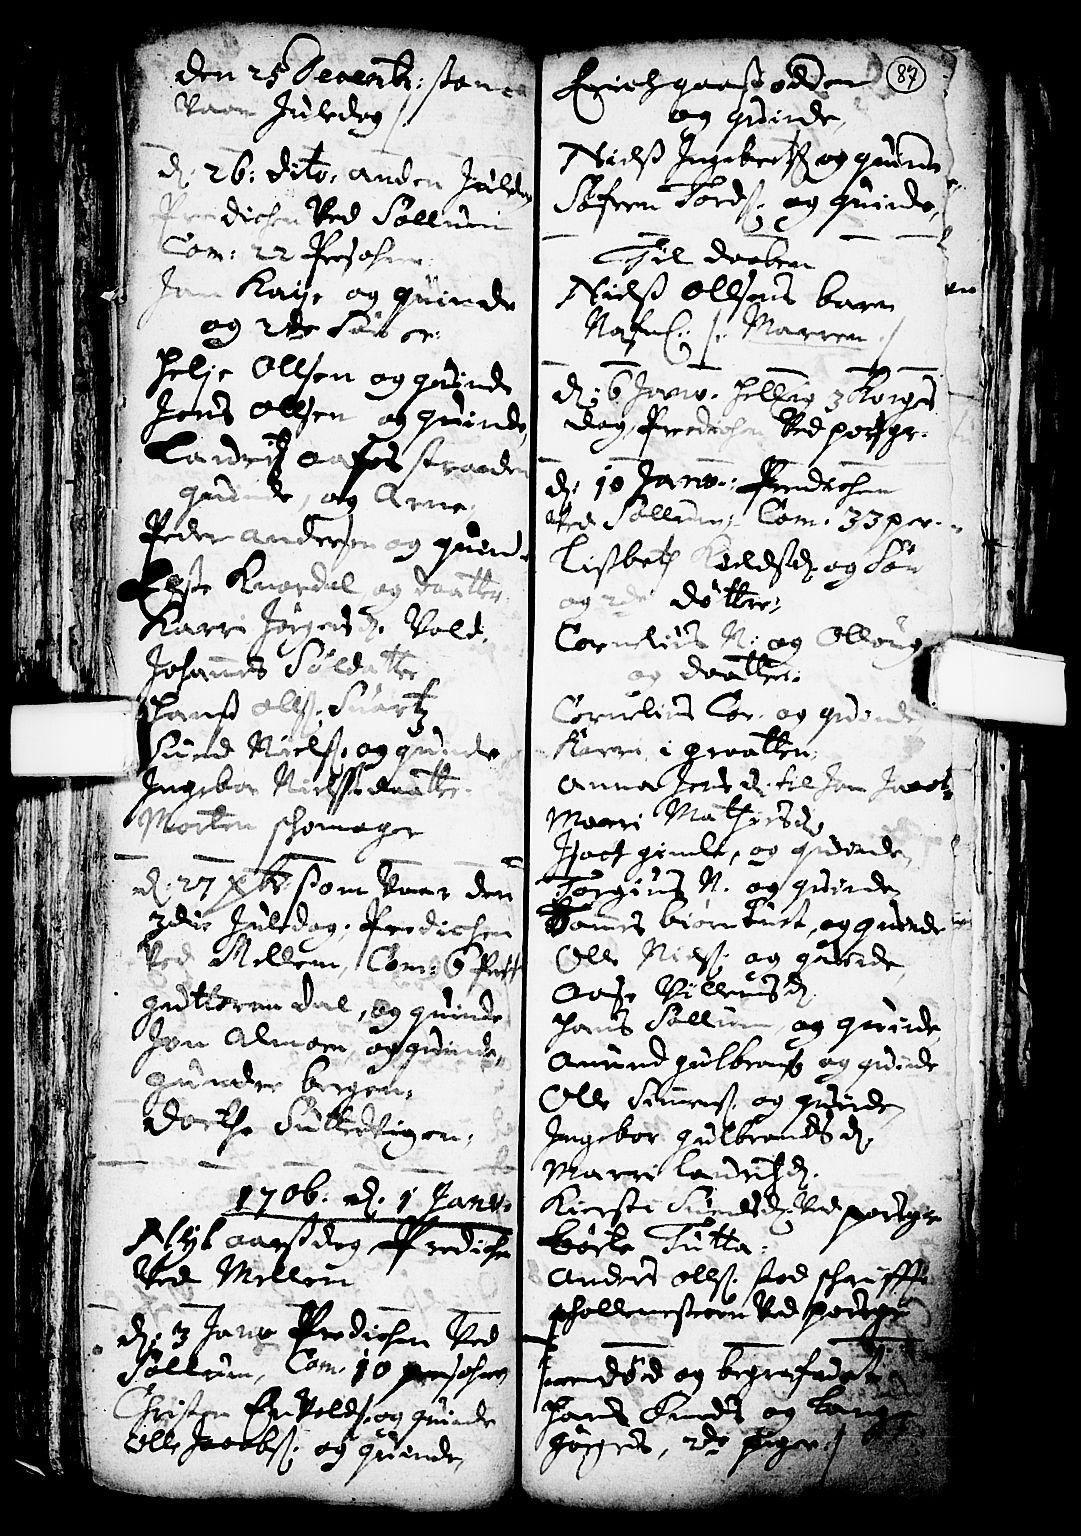 SAKO, Solum kirkebøker, F/Fa/L0001: Ministerialbok nr. I 1, 1701-1716, s. 87